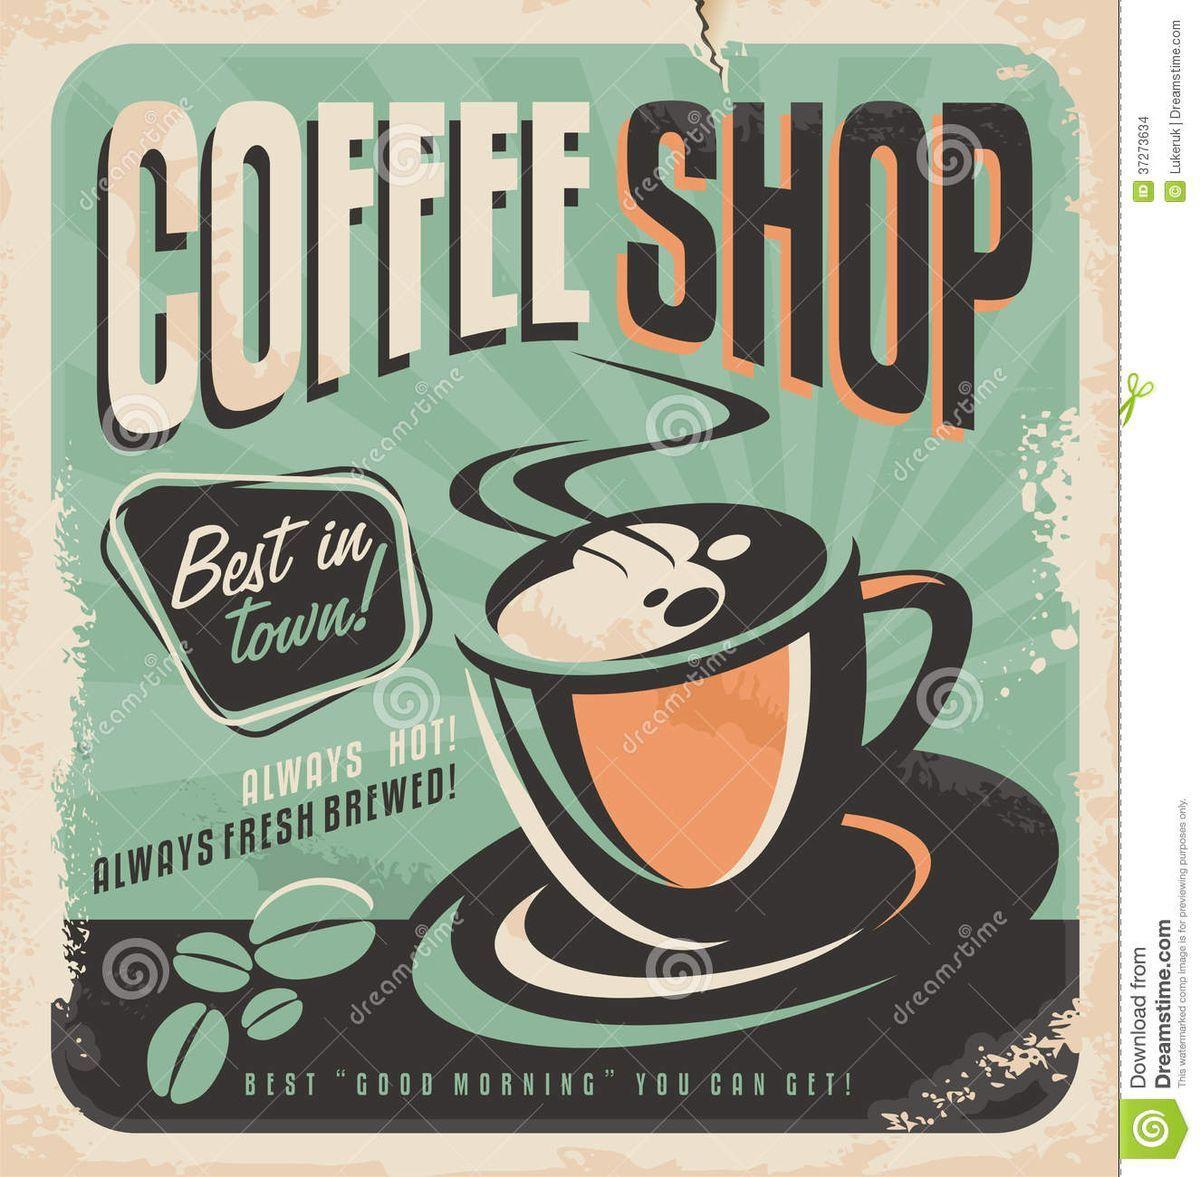 Pin By Patti Floyd On Coffee Maxwell House Retro Retro Poster Coffee Poster Coffee Shop